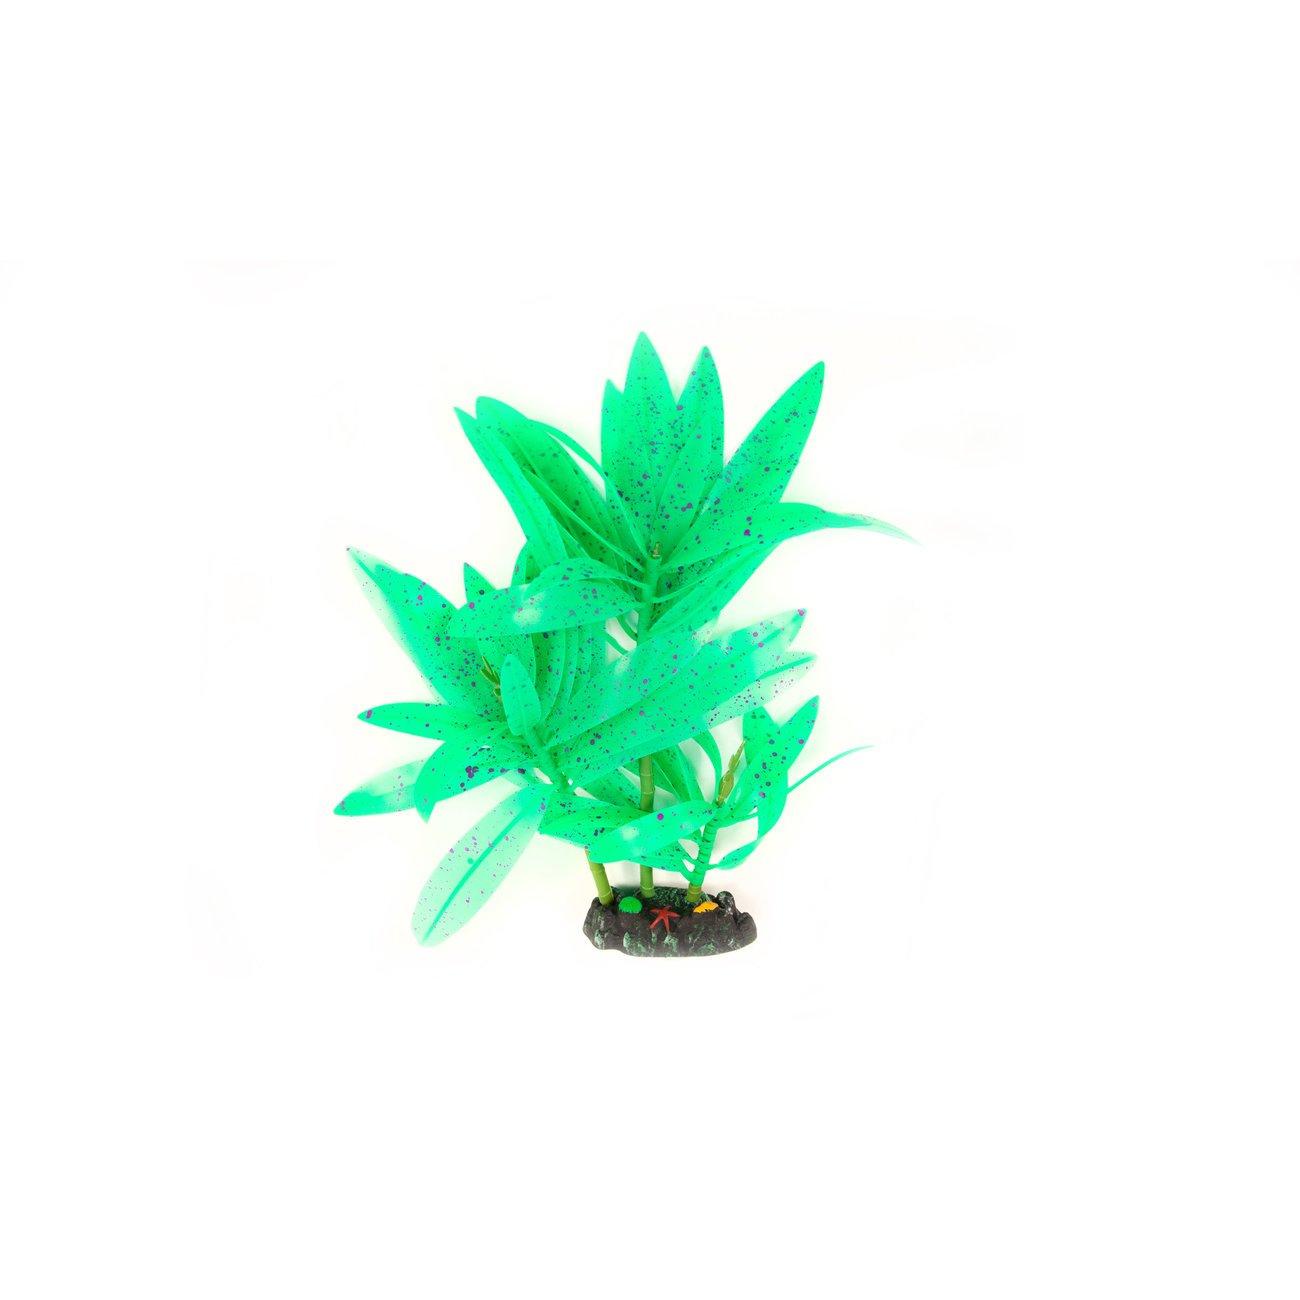 Aquatlantis Aqua Glow Sternenbaum, Bild 2